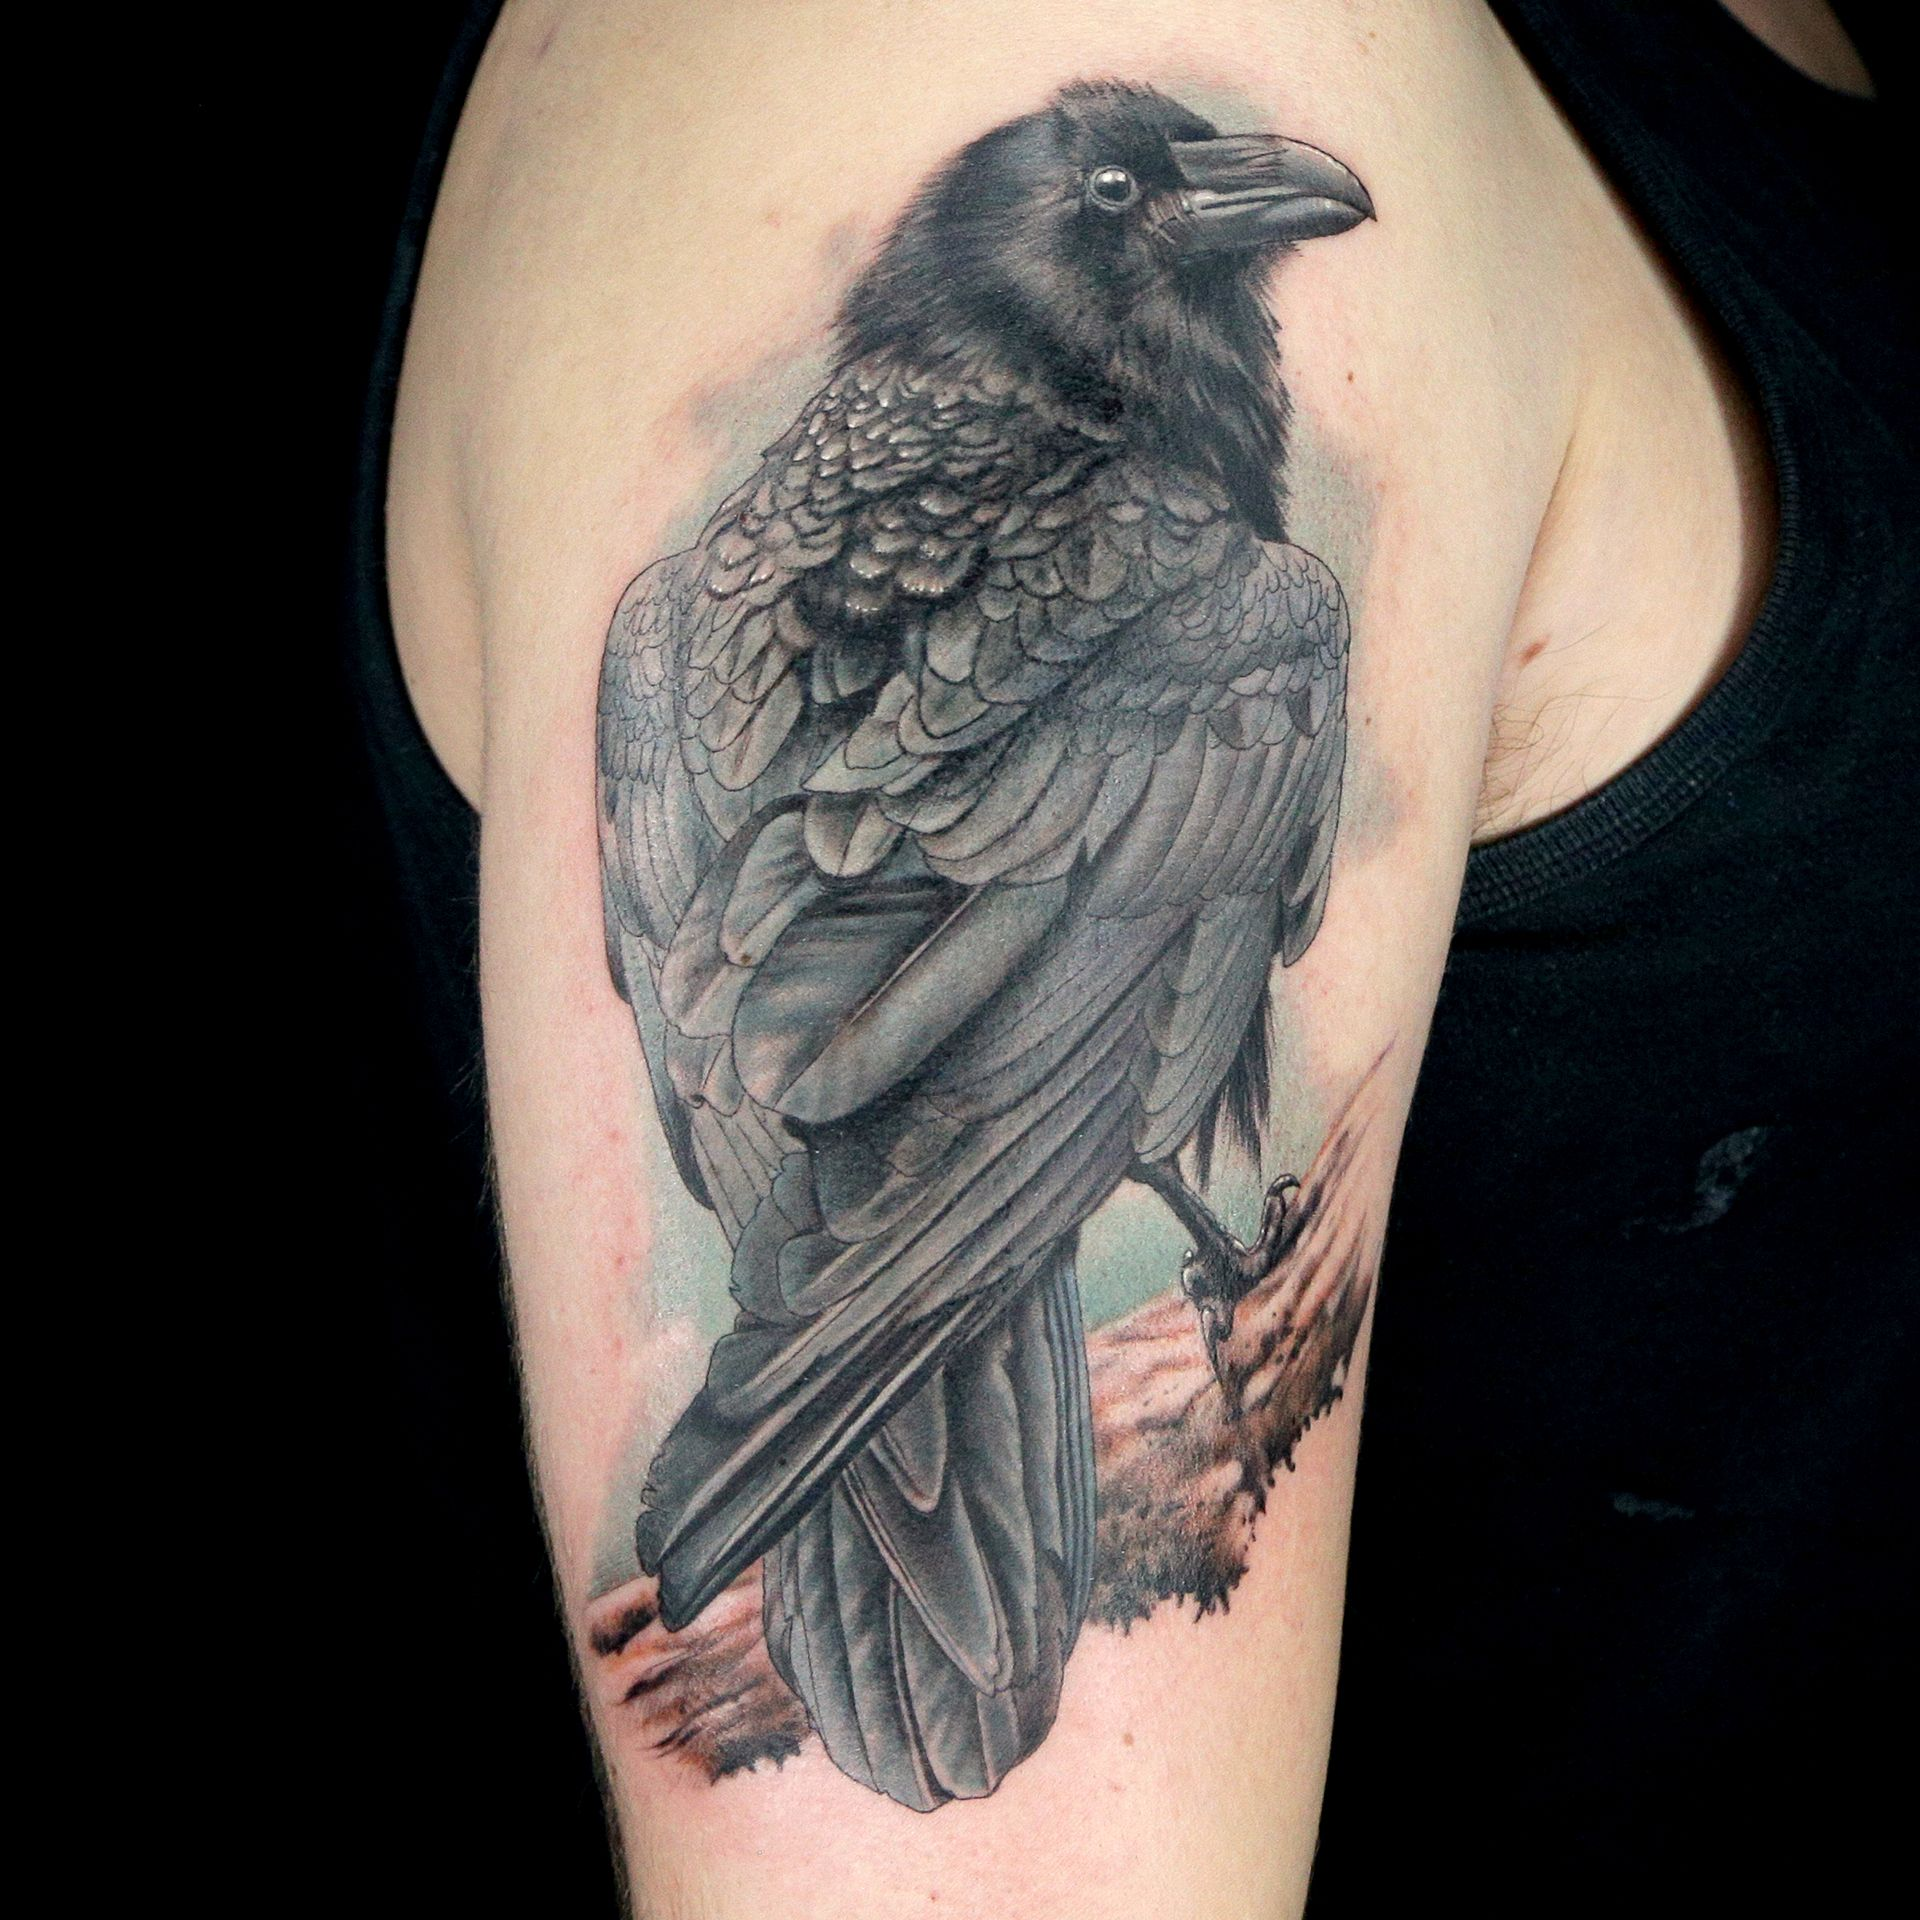 Color Realistic Raven Tattoo By Old Town Ink Bubba Irwin Dj Tambe Raven Tattoo Tattoos Ink Tattoo